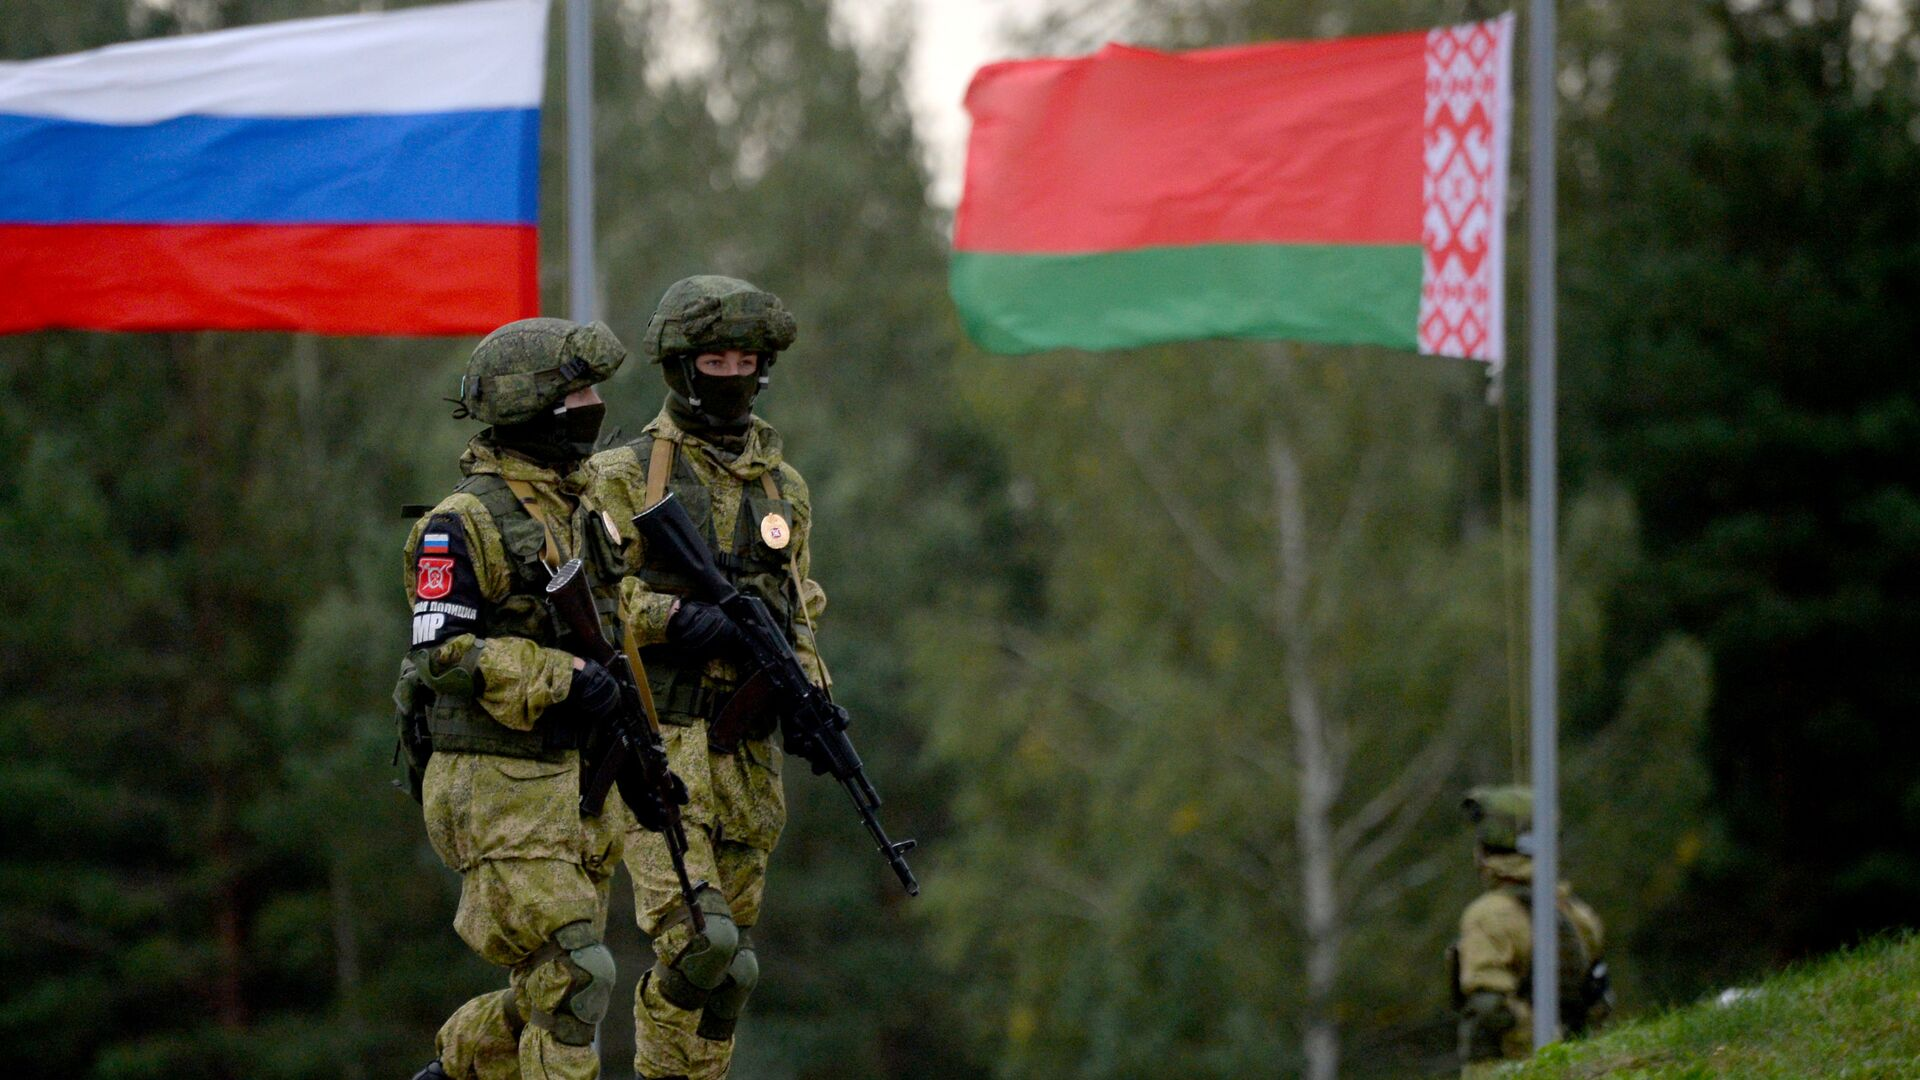 Rusko-beloruske vojne vežbe Zapad-2017  - Sputnik Srbija, 1920, 02.10.2021